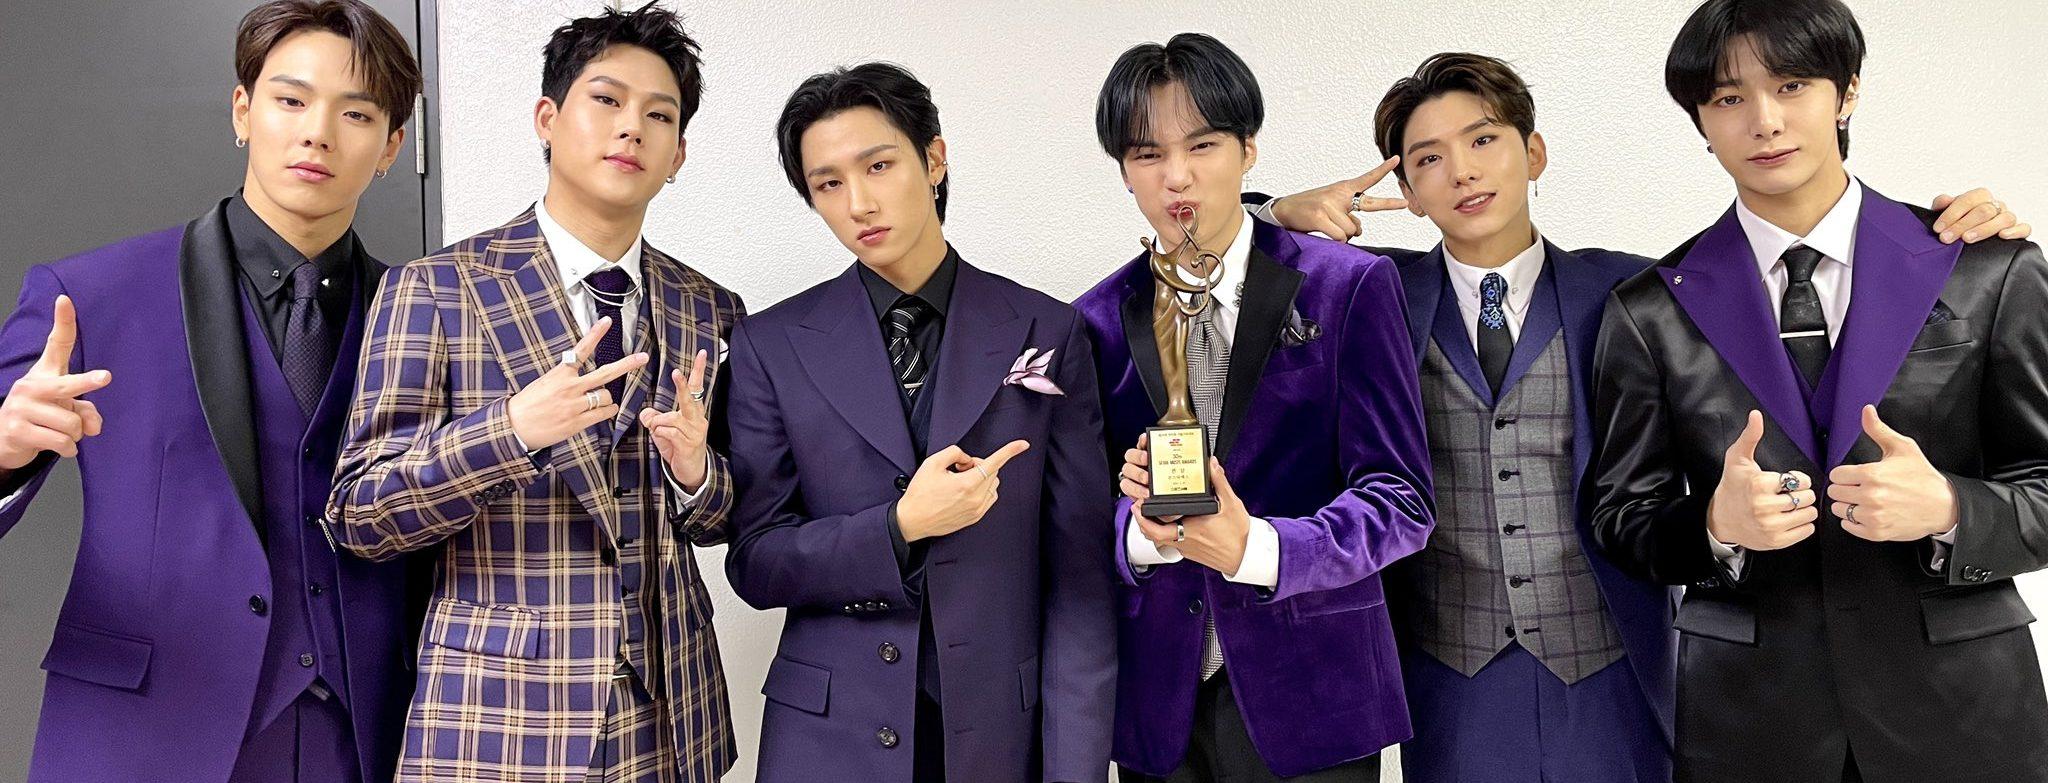 "MONSTA X Wins Bonsang At The ""30th High1 Seoul Music Awards"""